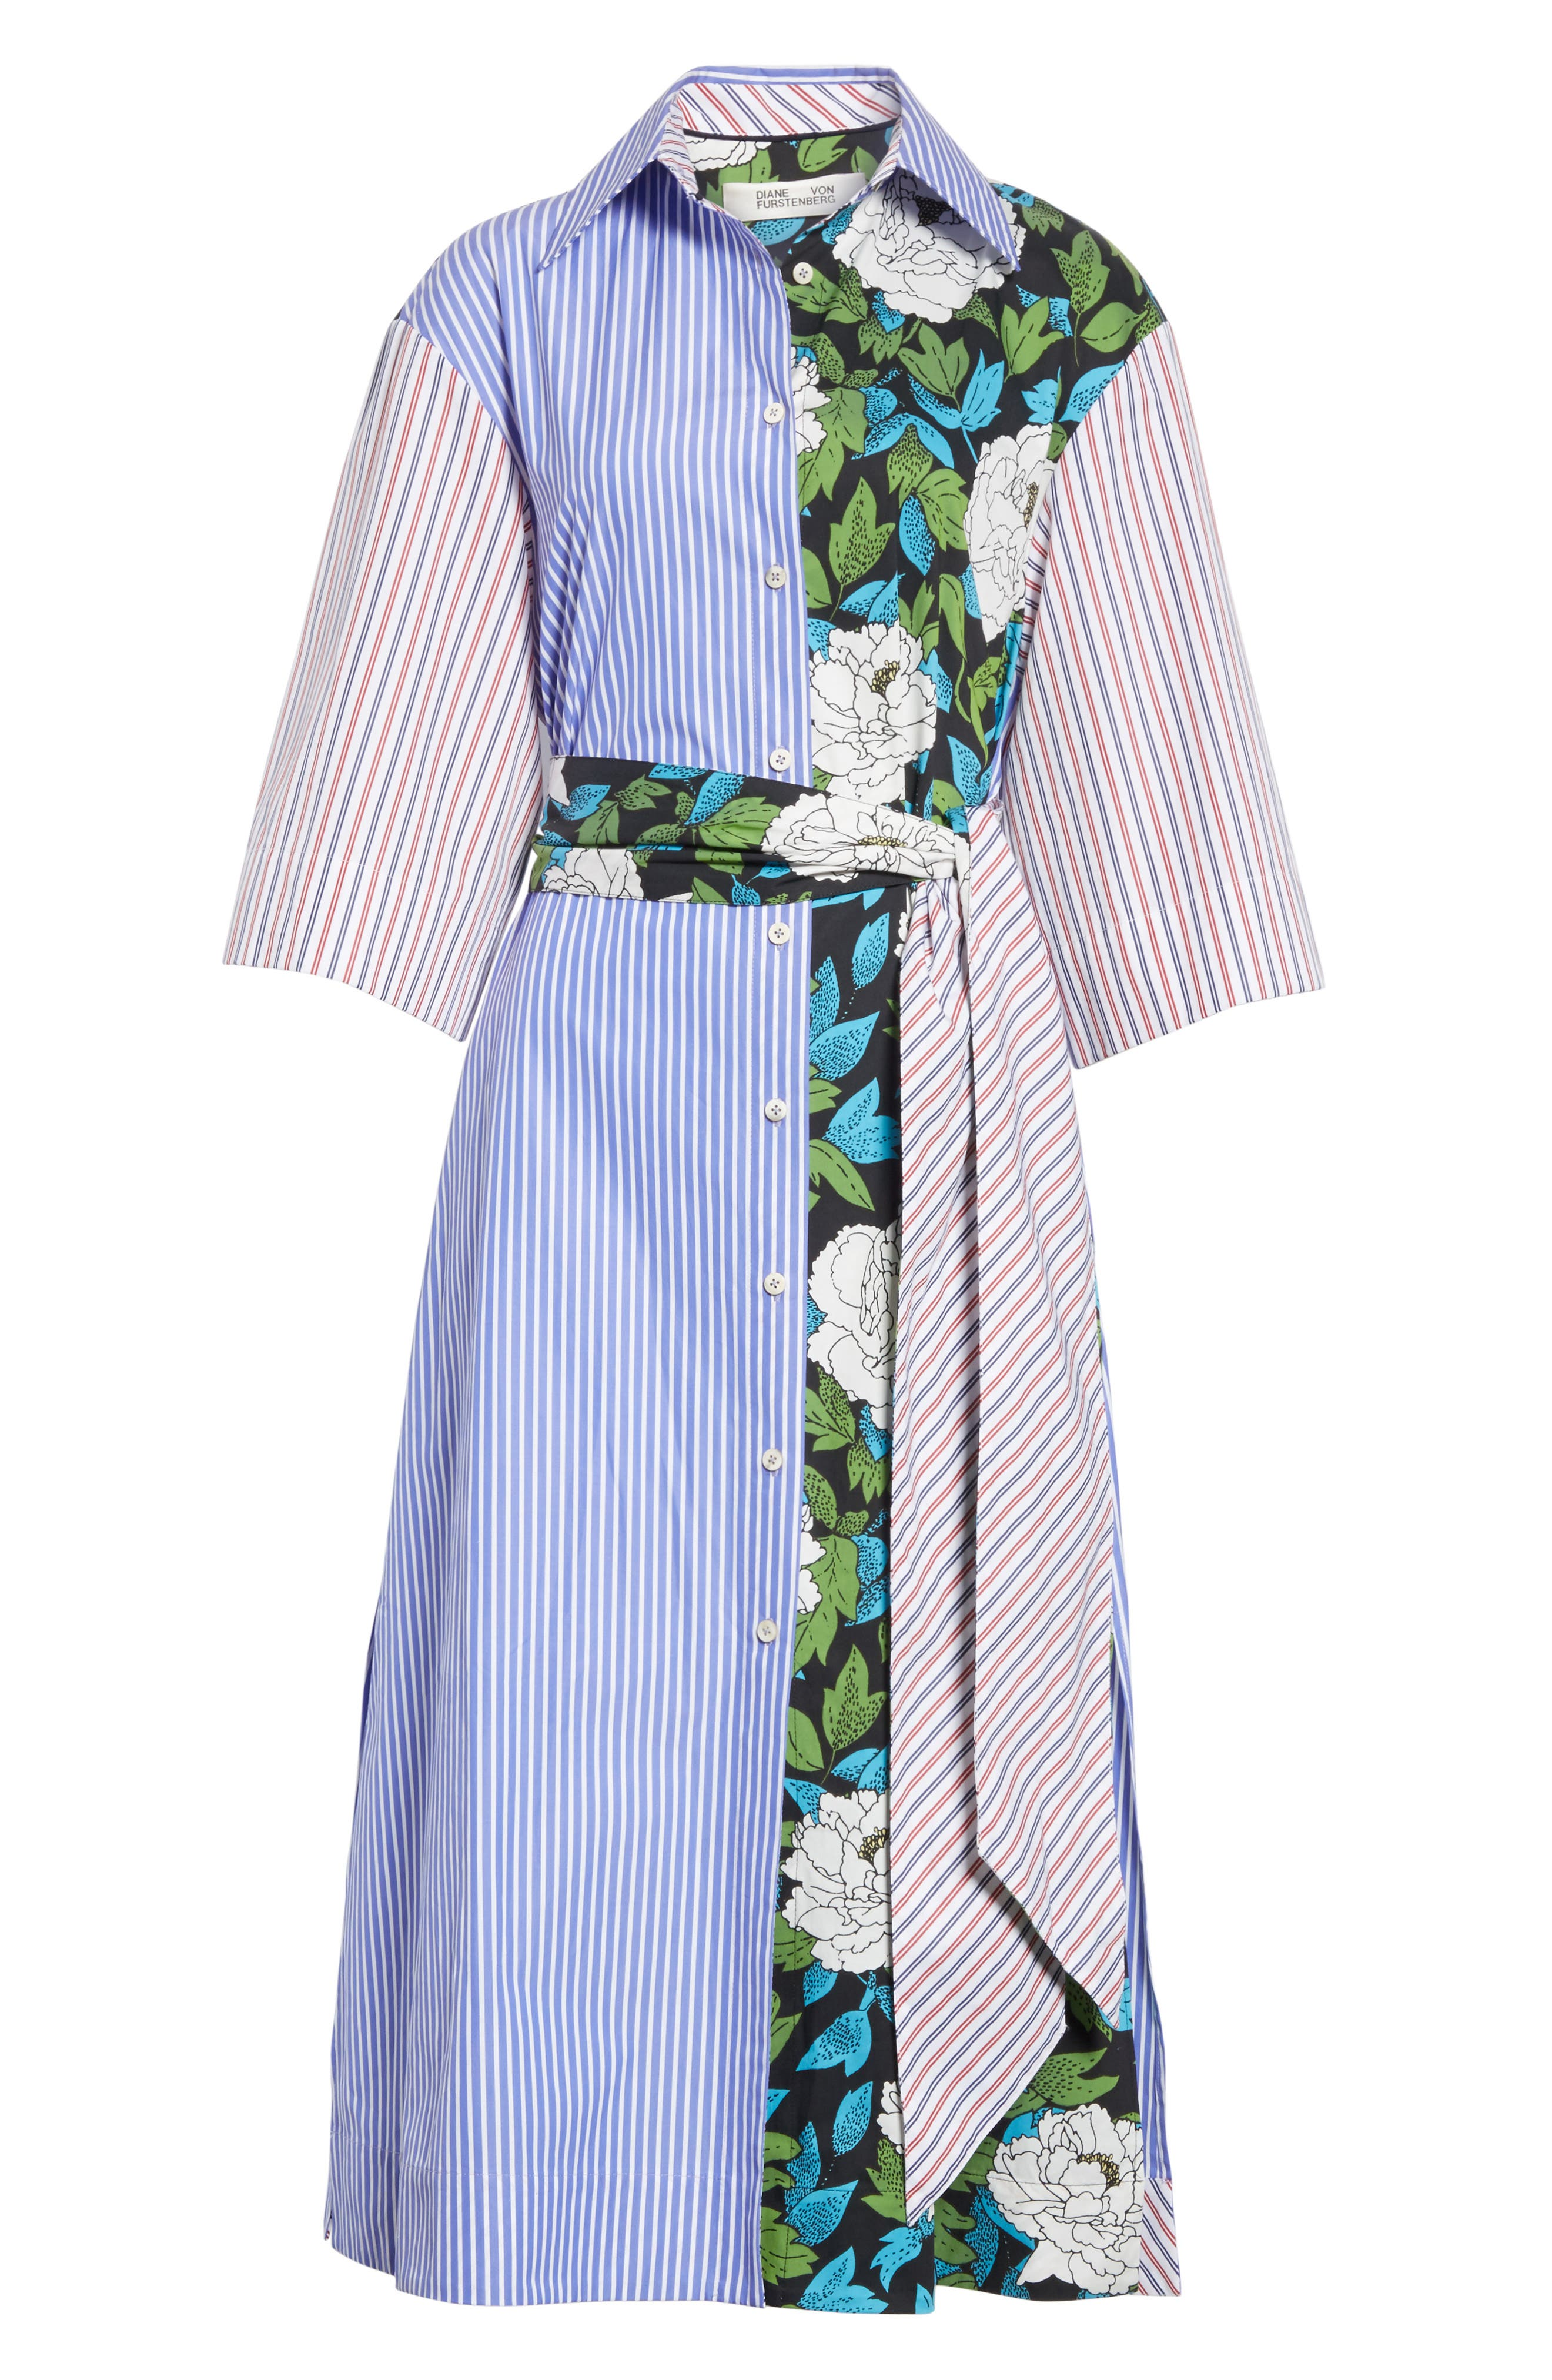 Diane von Furstenberg Mixed Print Cotton Shirtdress,                             Alternate thumbnail 6, color,